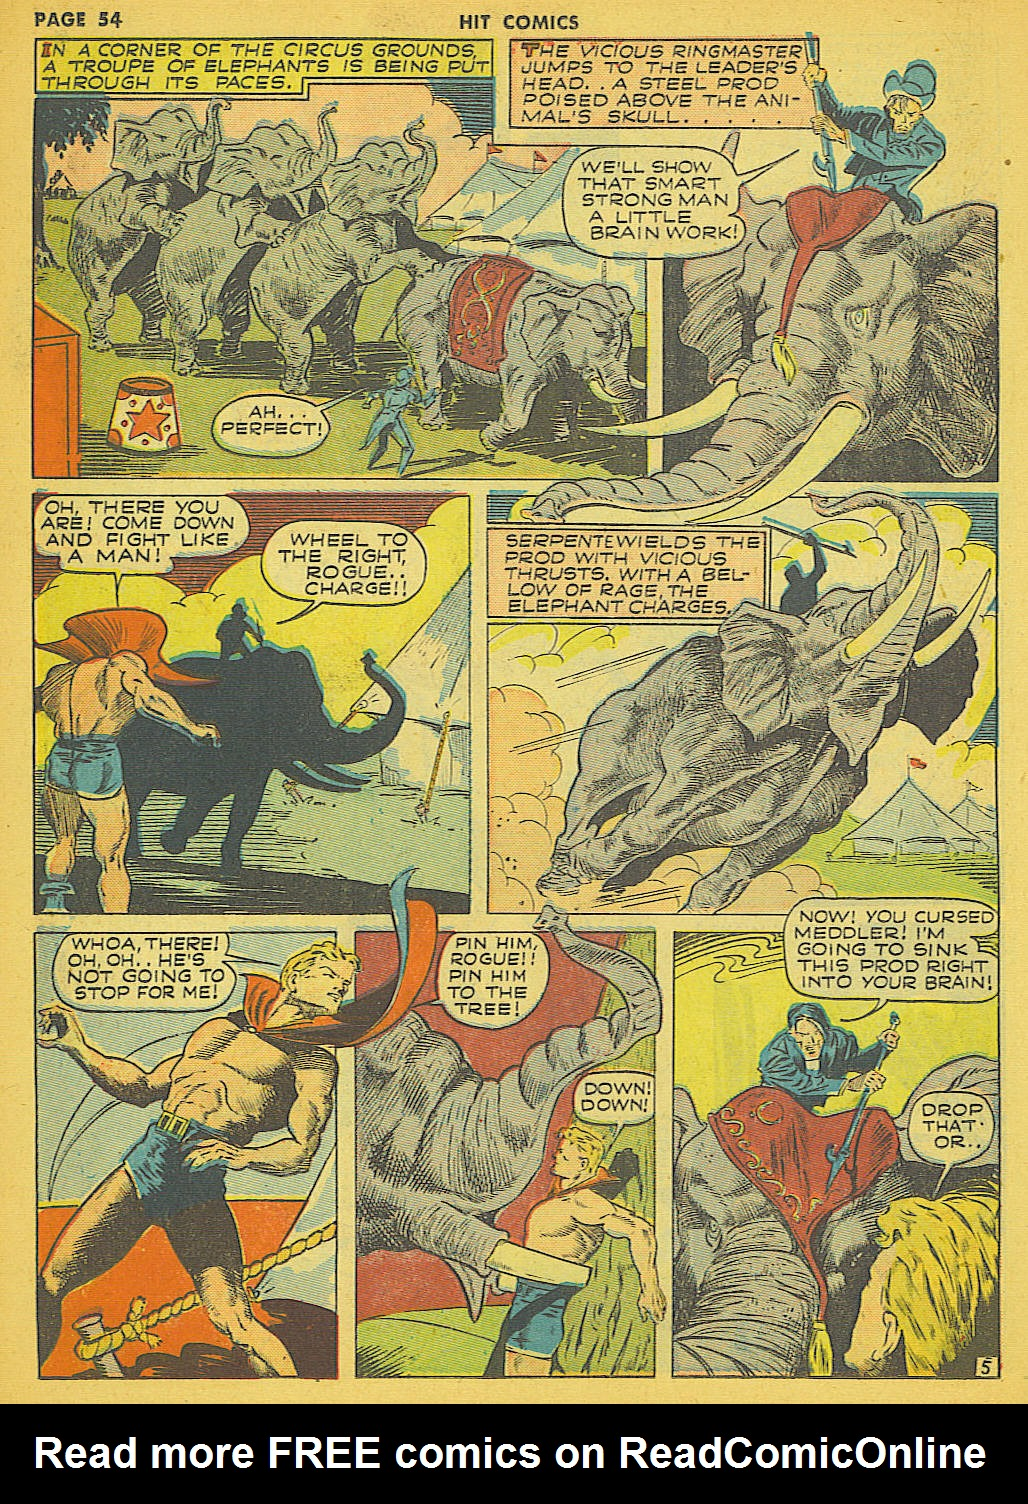 Read online Hit Comics comic -  Issue #21 - 56